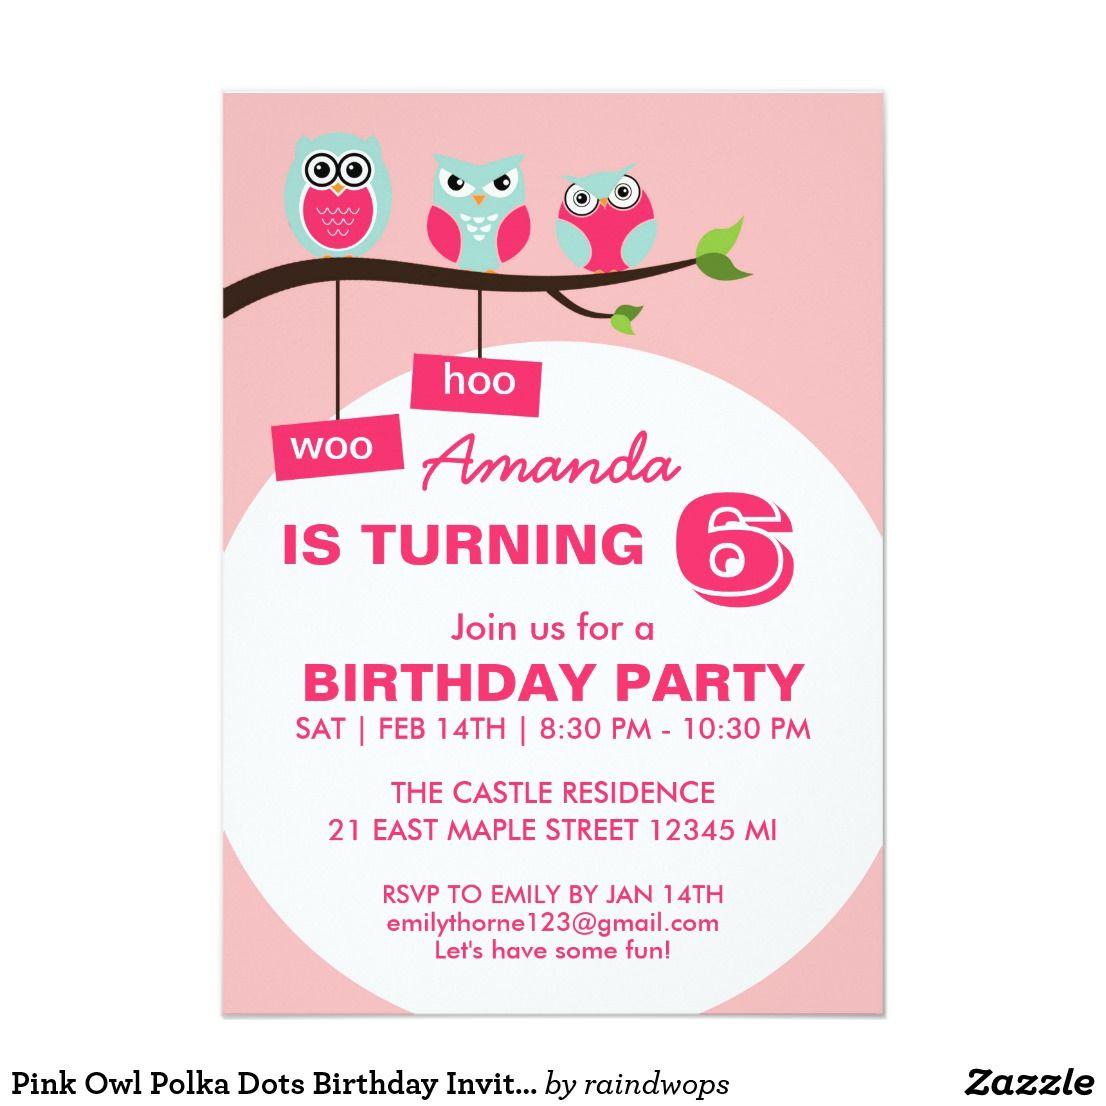 Pink Owl Polka Dots Birthday Invitation for Kids | Polka dot ...